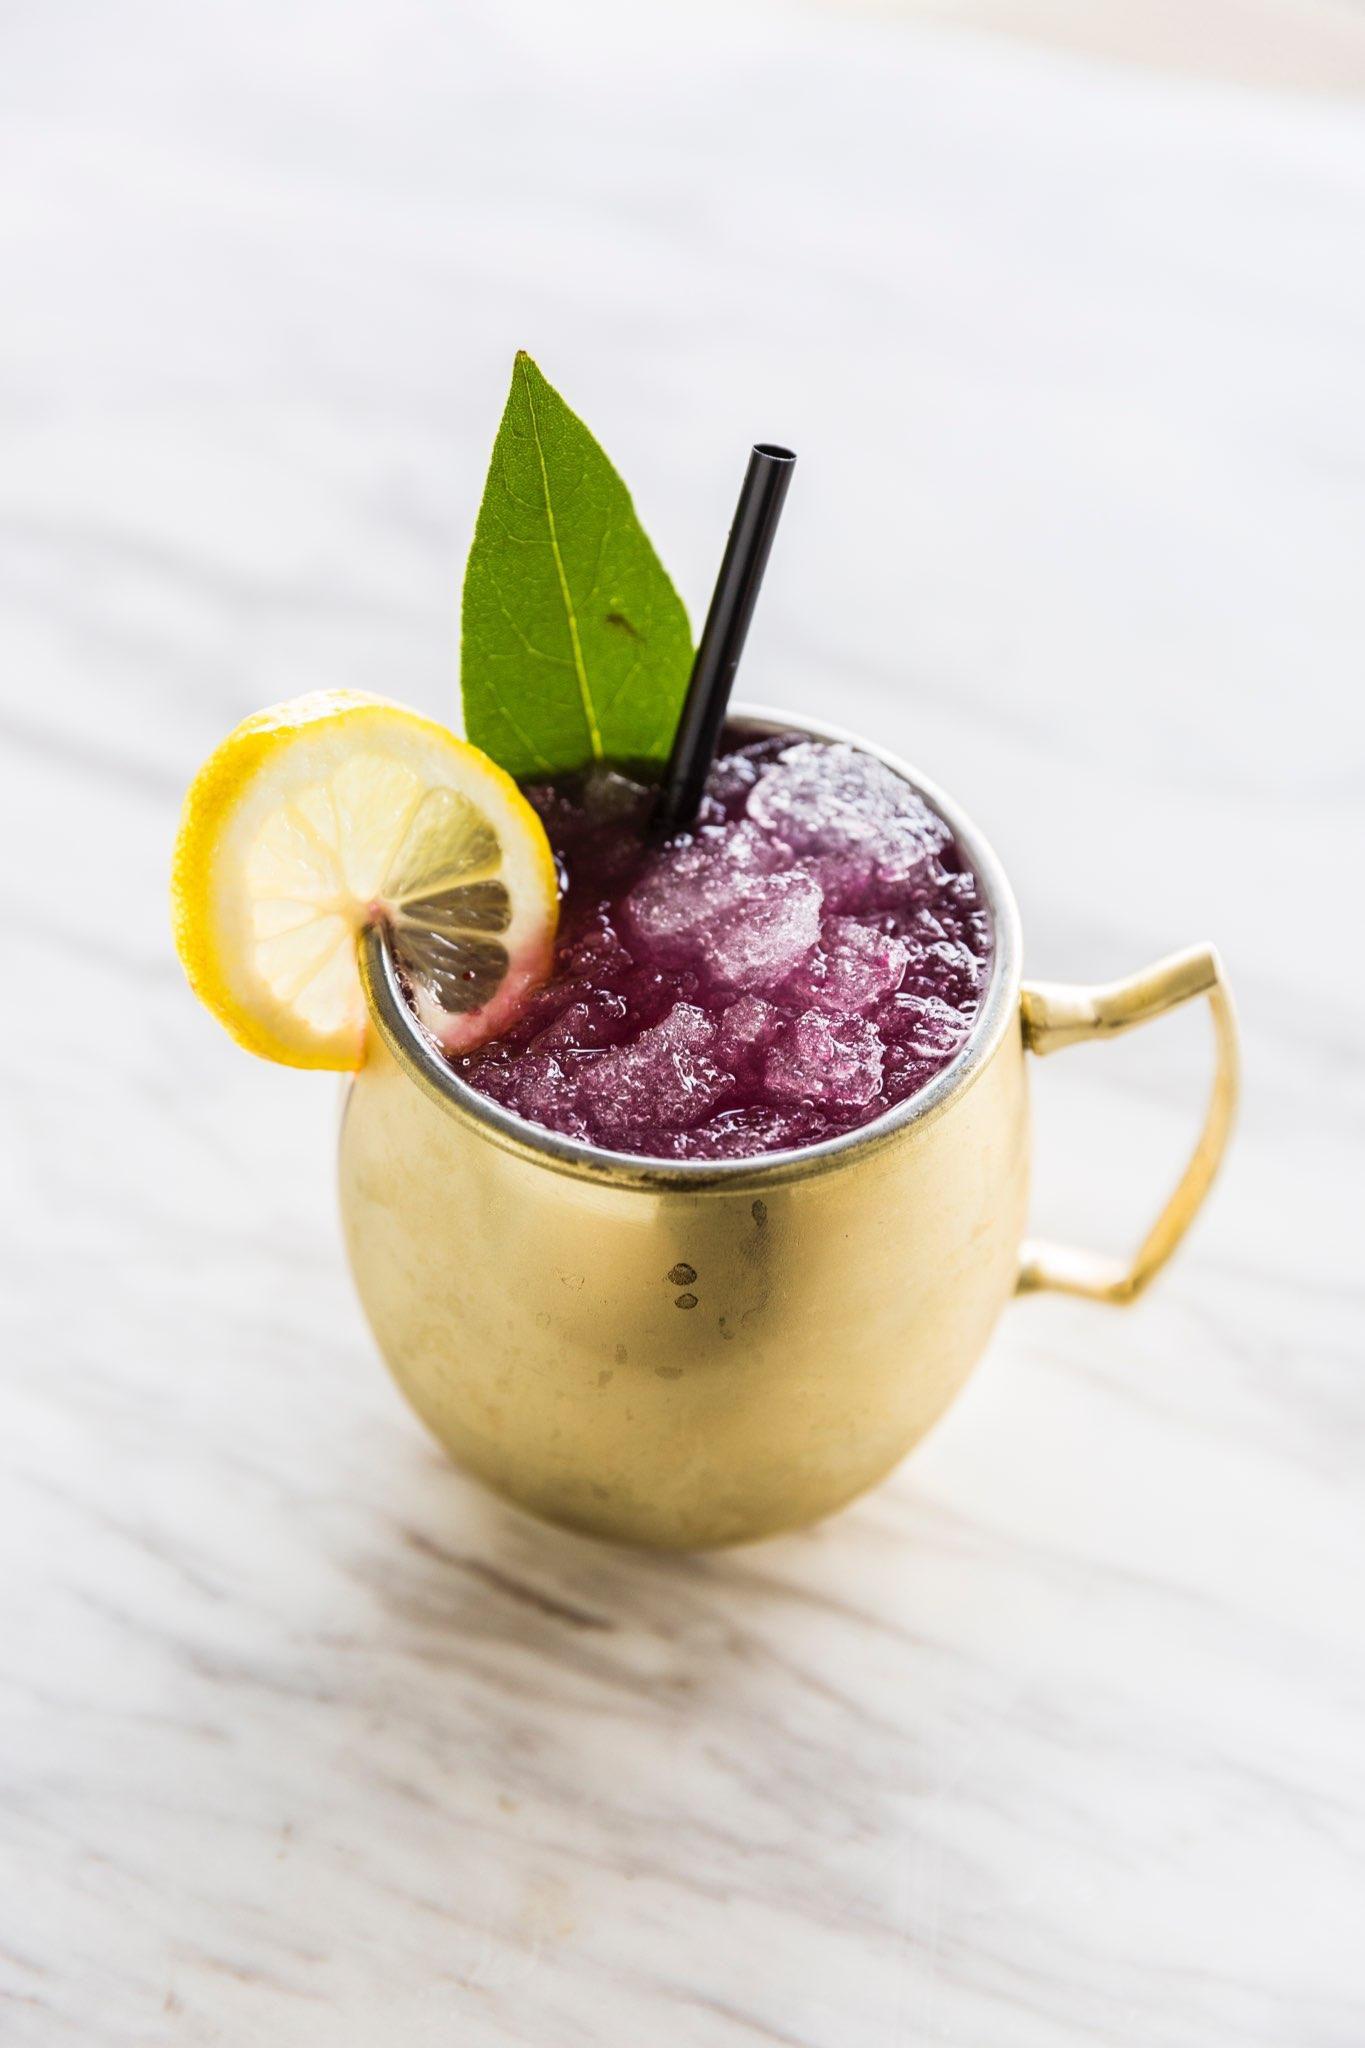 alcohol, signature cocktail, drink, glass, ice, beverage, bar, mule mug, copper mug